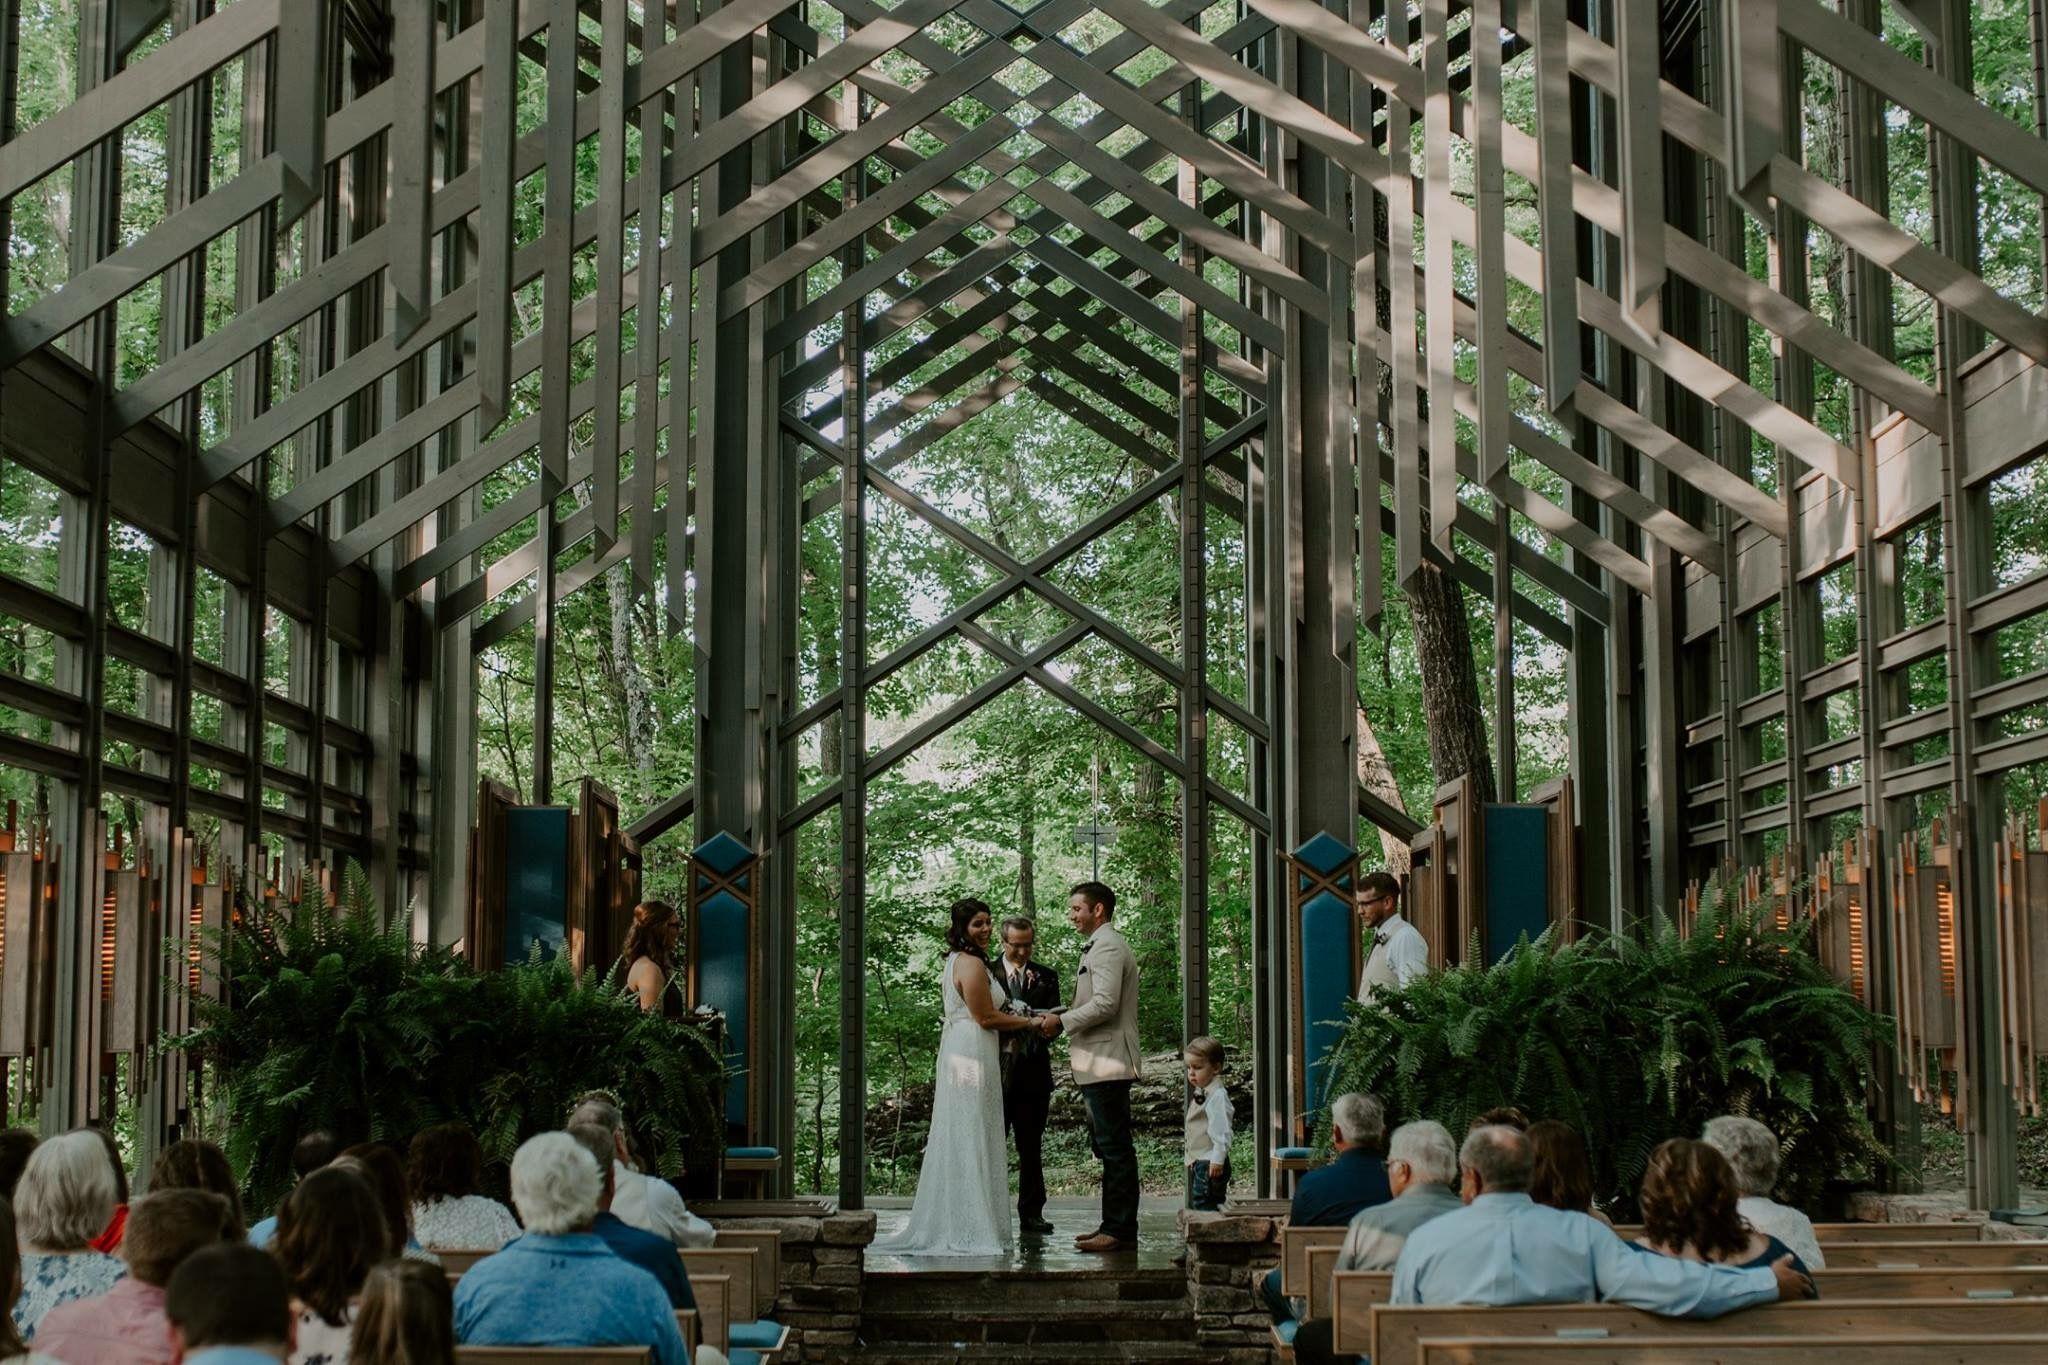 Thorncrown Chapel Elopement Intimate Wedding Arkansas Eureka Springs Thorncrown Chapel W Thorncrown Chapel Eureka Springs Thorncrown Chapel Eureka Springs